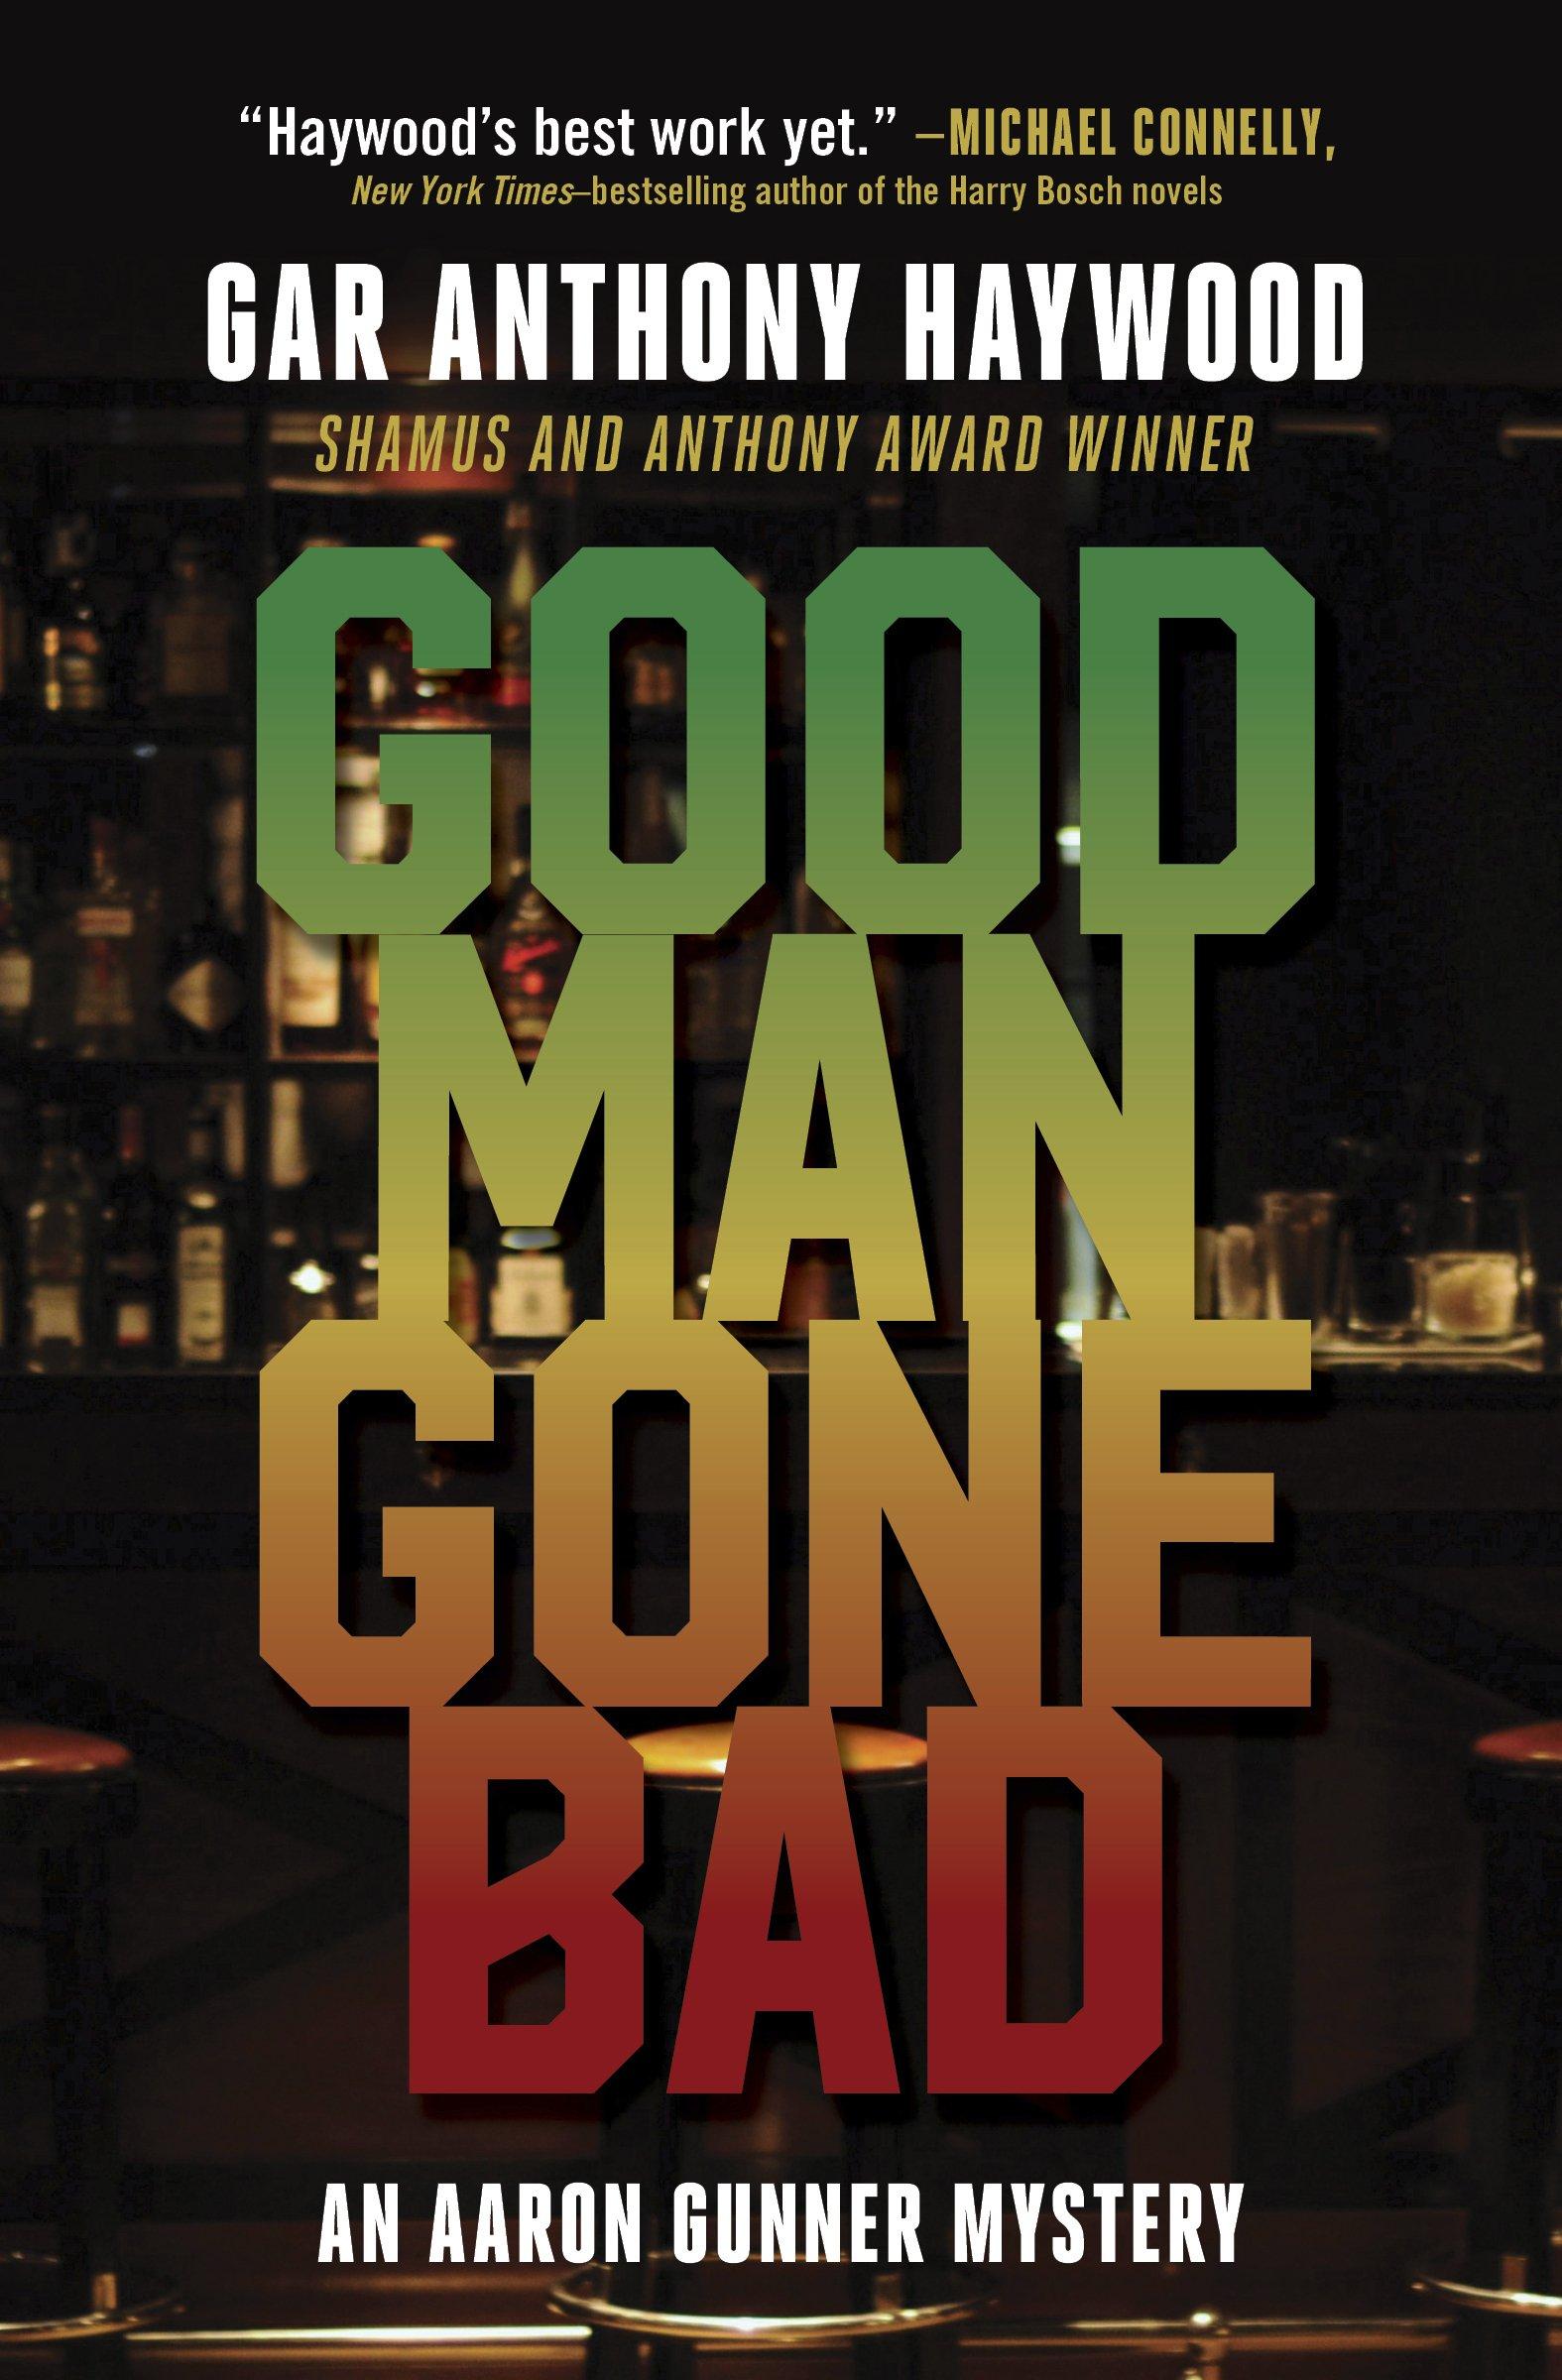 'Good Man Gone Bad' is dark, brooding tale